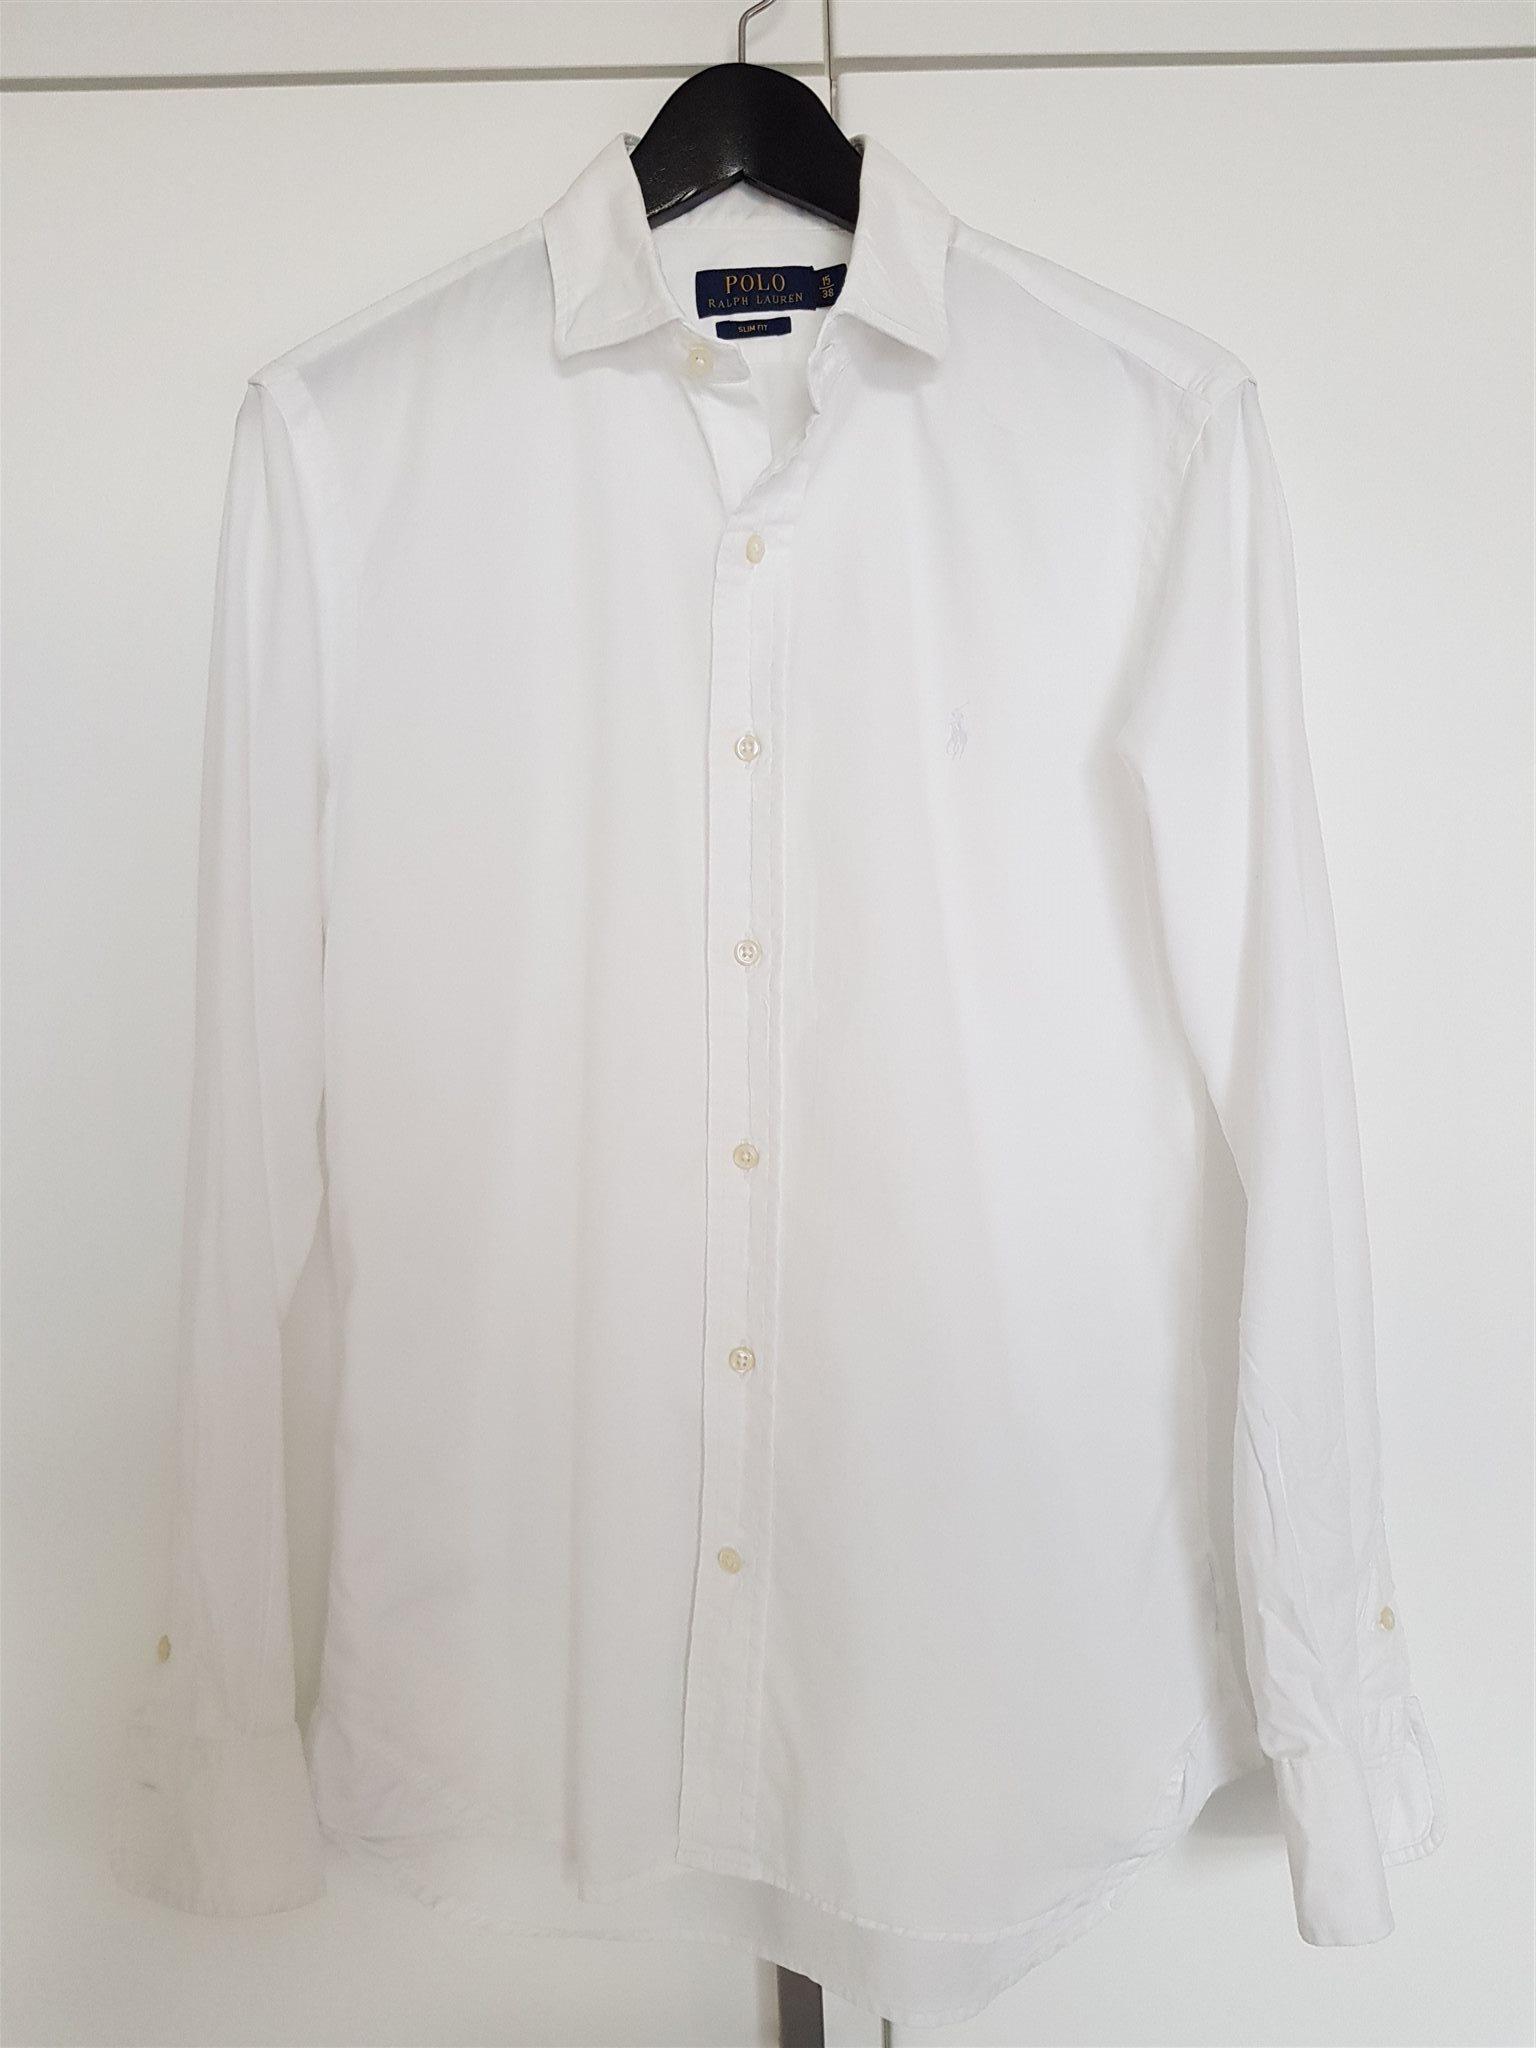 Polo Ralph Lauren - Vit slimfit skjorta i storl.. (334186974) ᐈ Köp ... c41e952054cc4